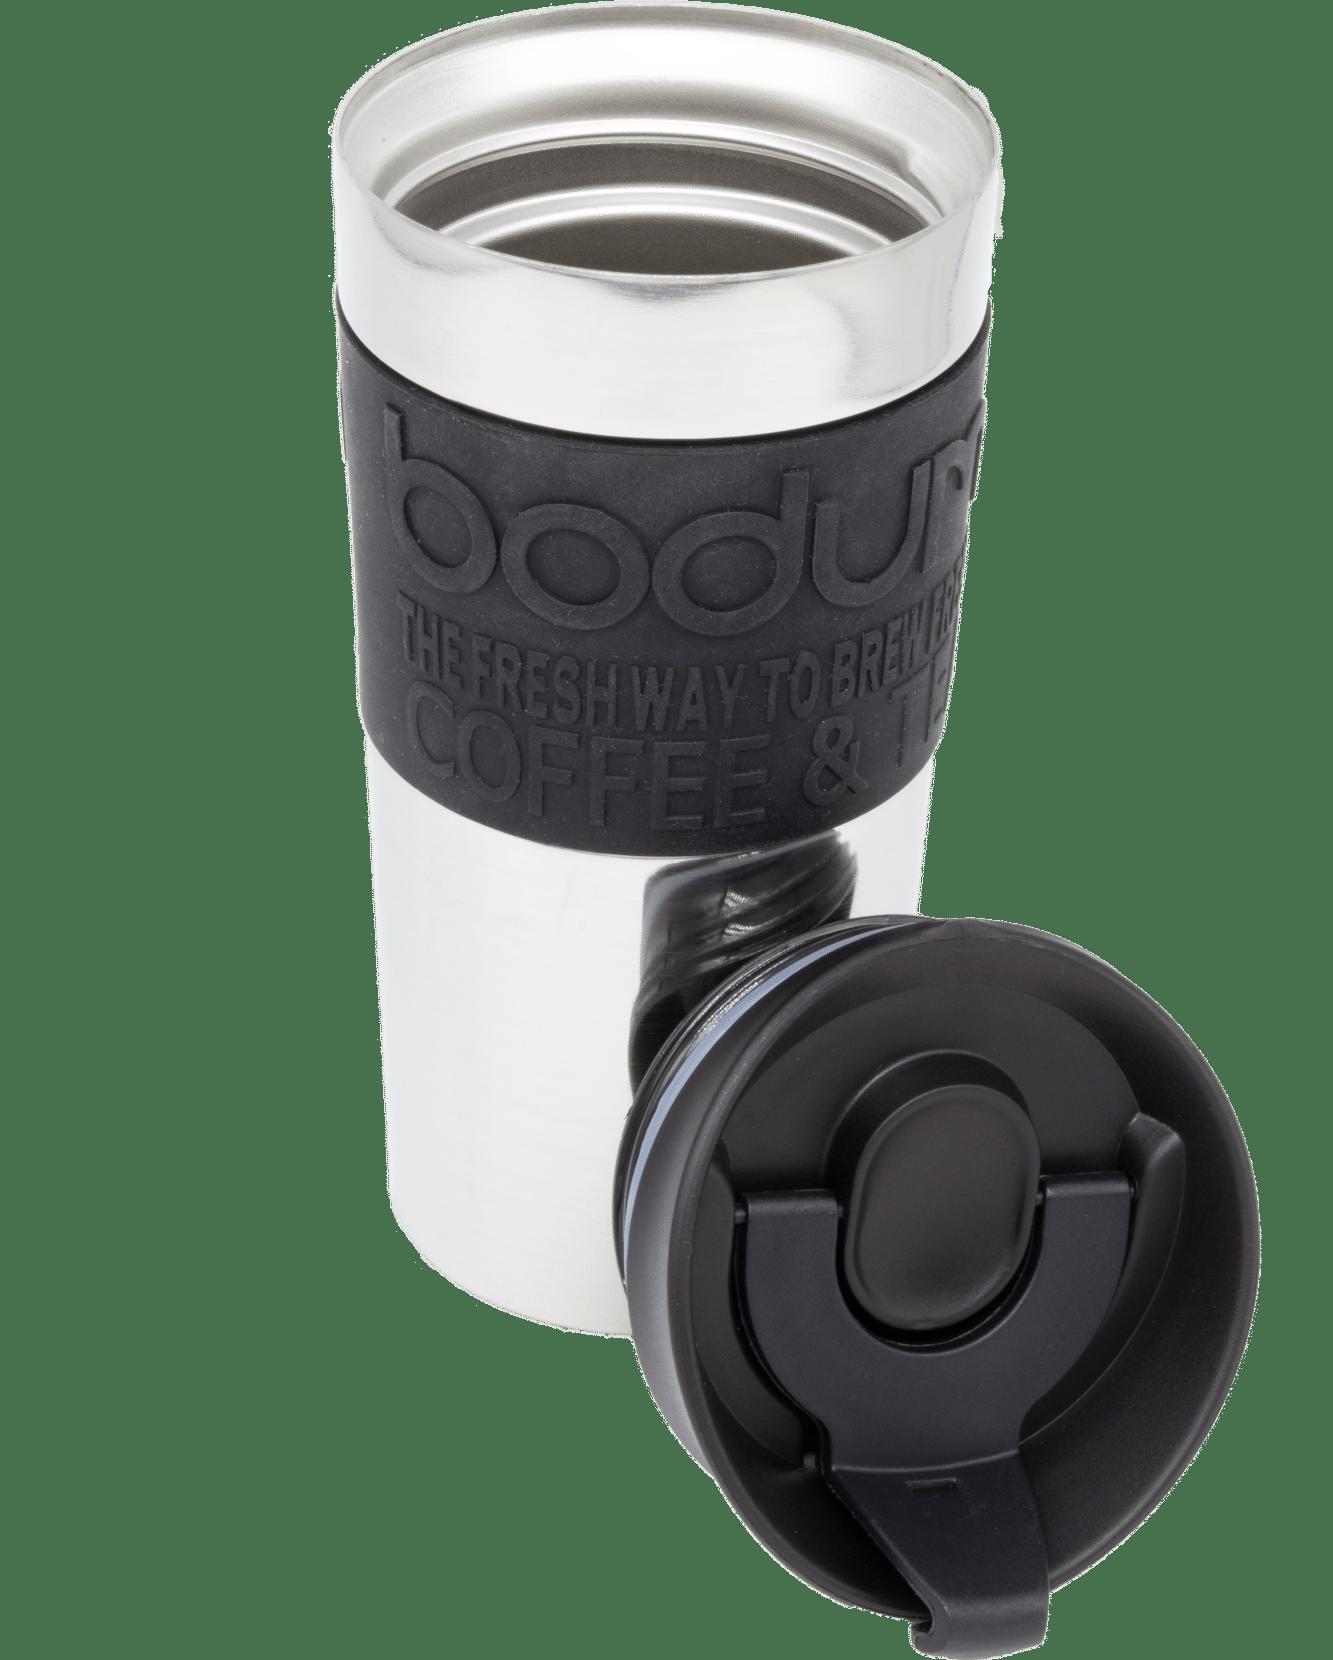 Bodum Travel Mug 1000x1200